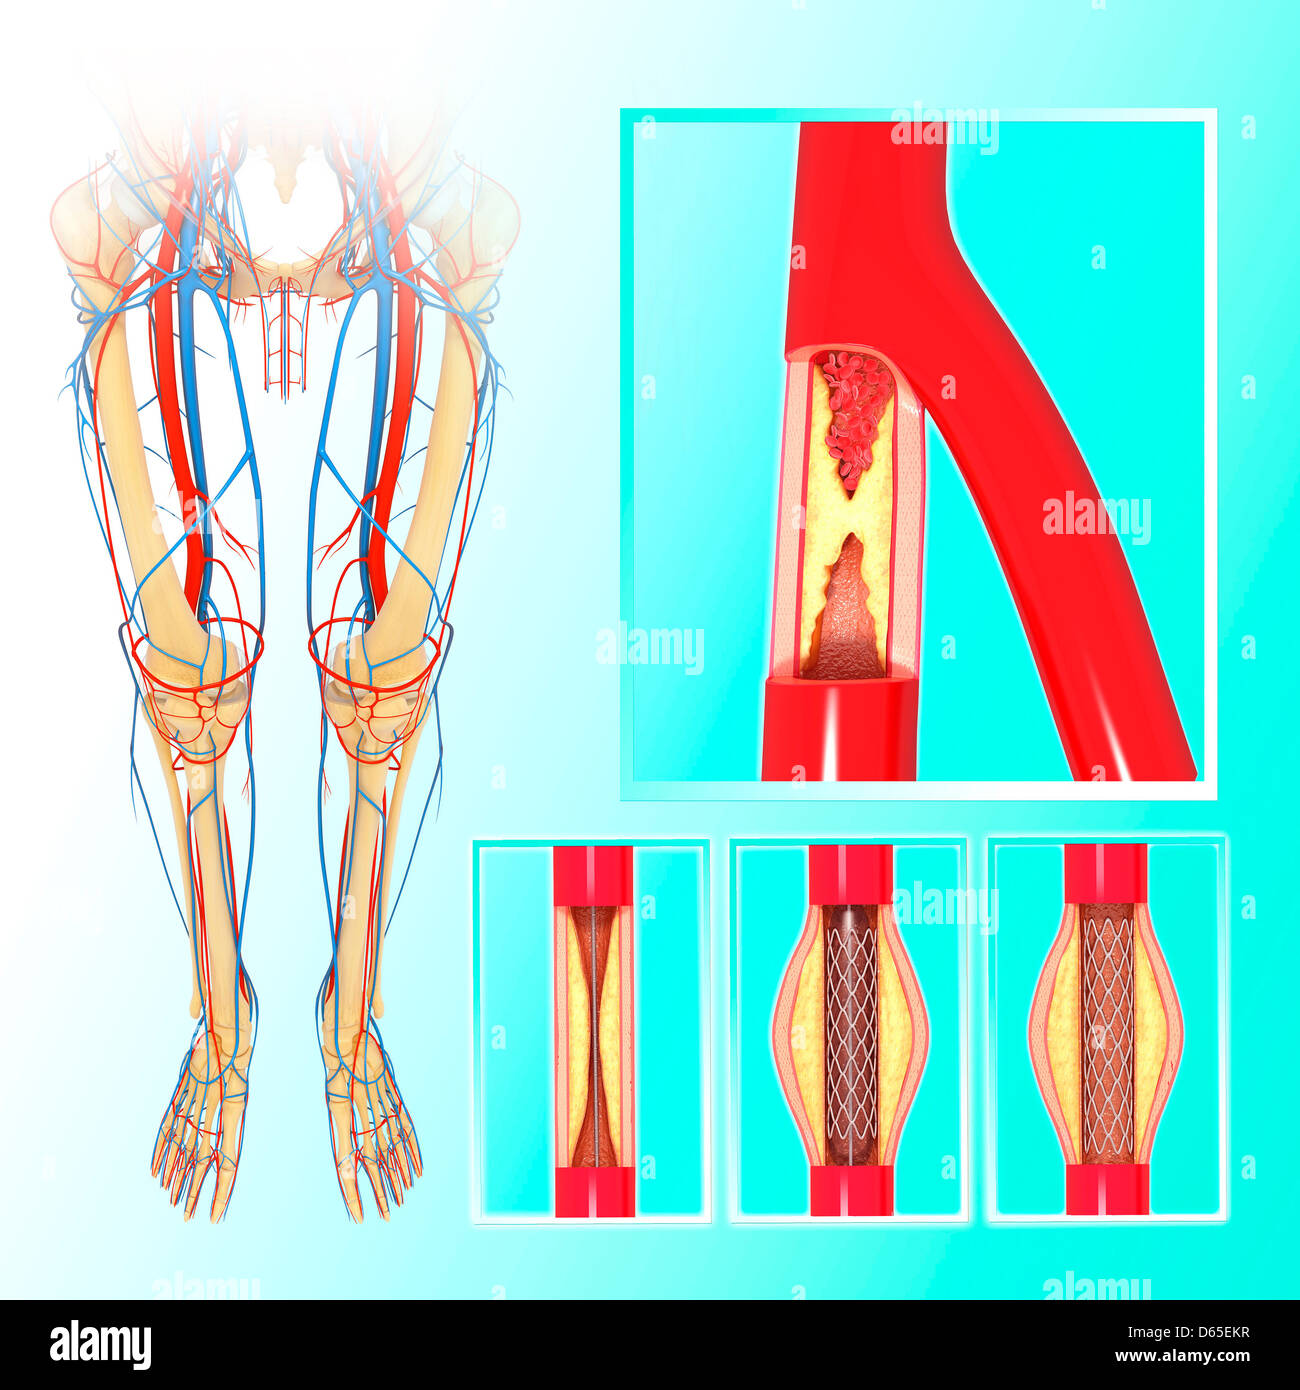 Leg Arteries Stock Photos & Leg Arteries Stock Images - Alamy